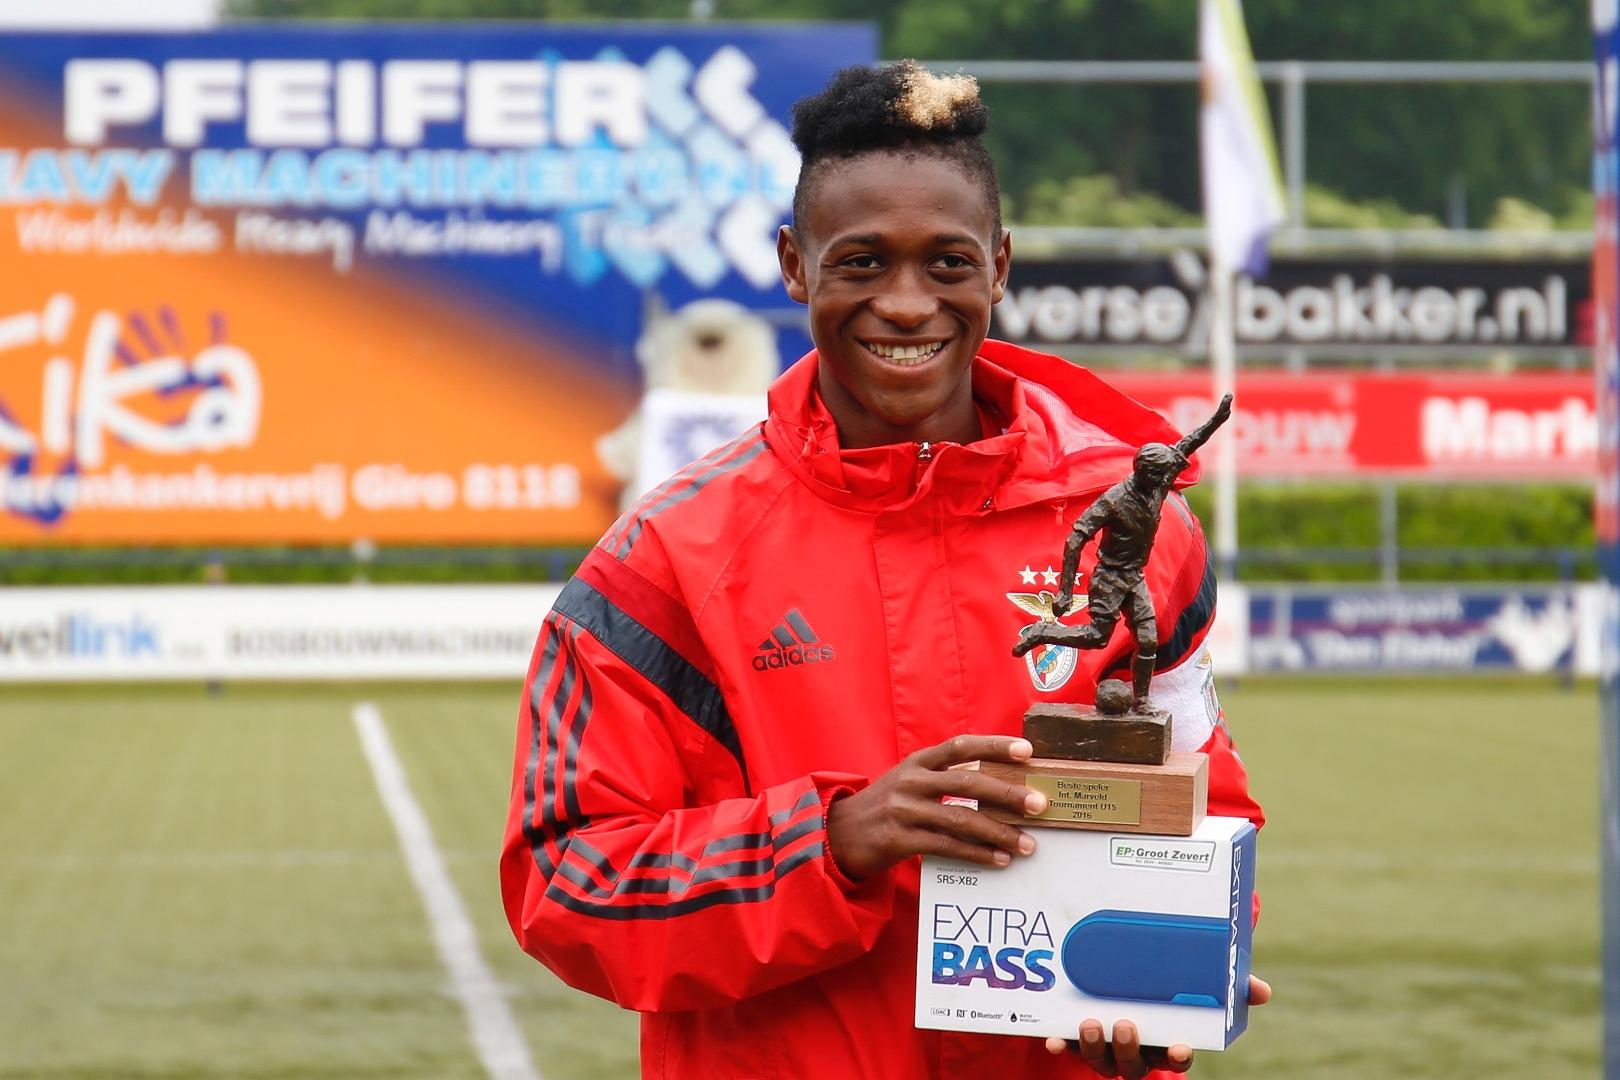 Marveld Tournament 2016 - Best Player Umaro Embalo of SL Benfica